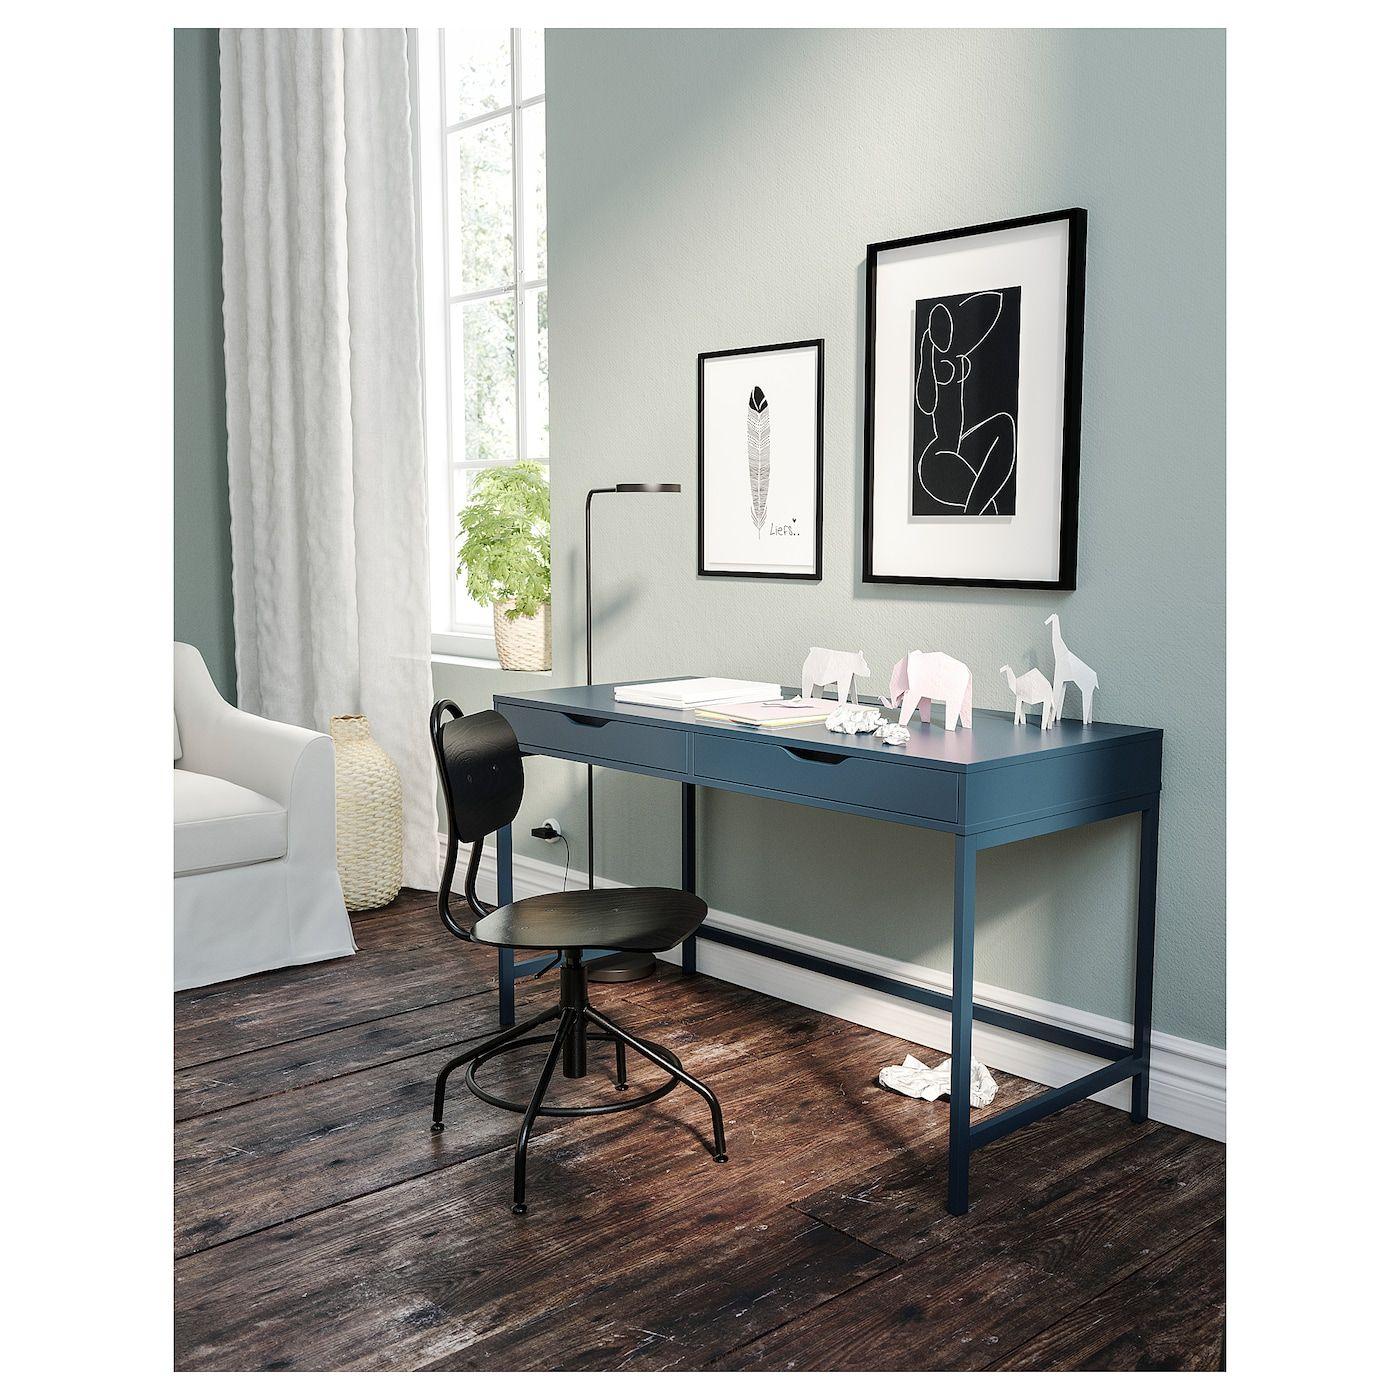 IKEA ALEX Blue Desk Ikea alex desk, Alex desk, Ikea alex